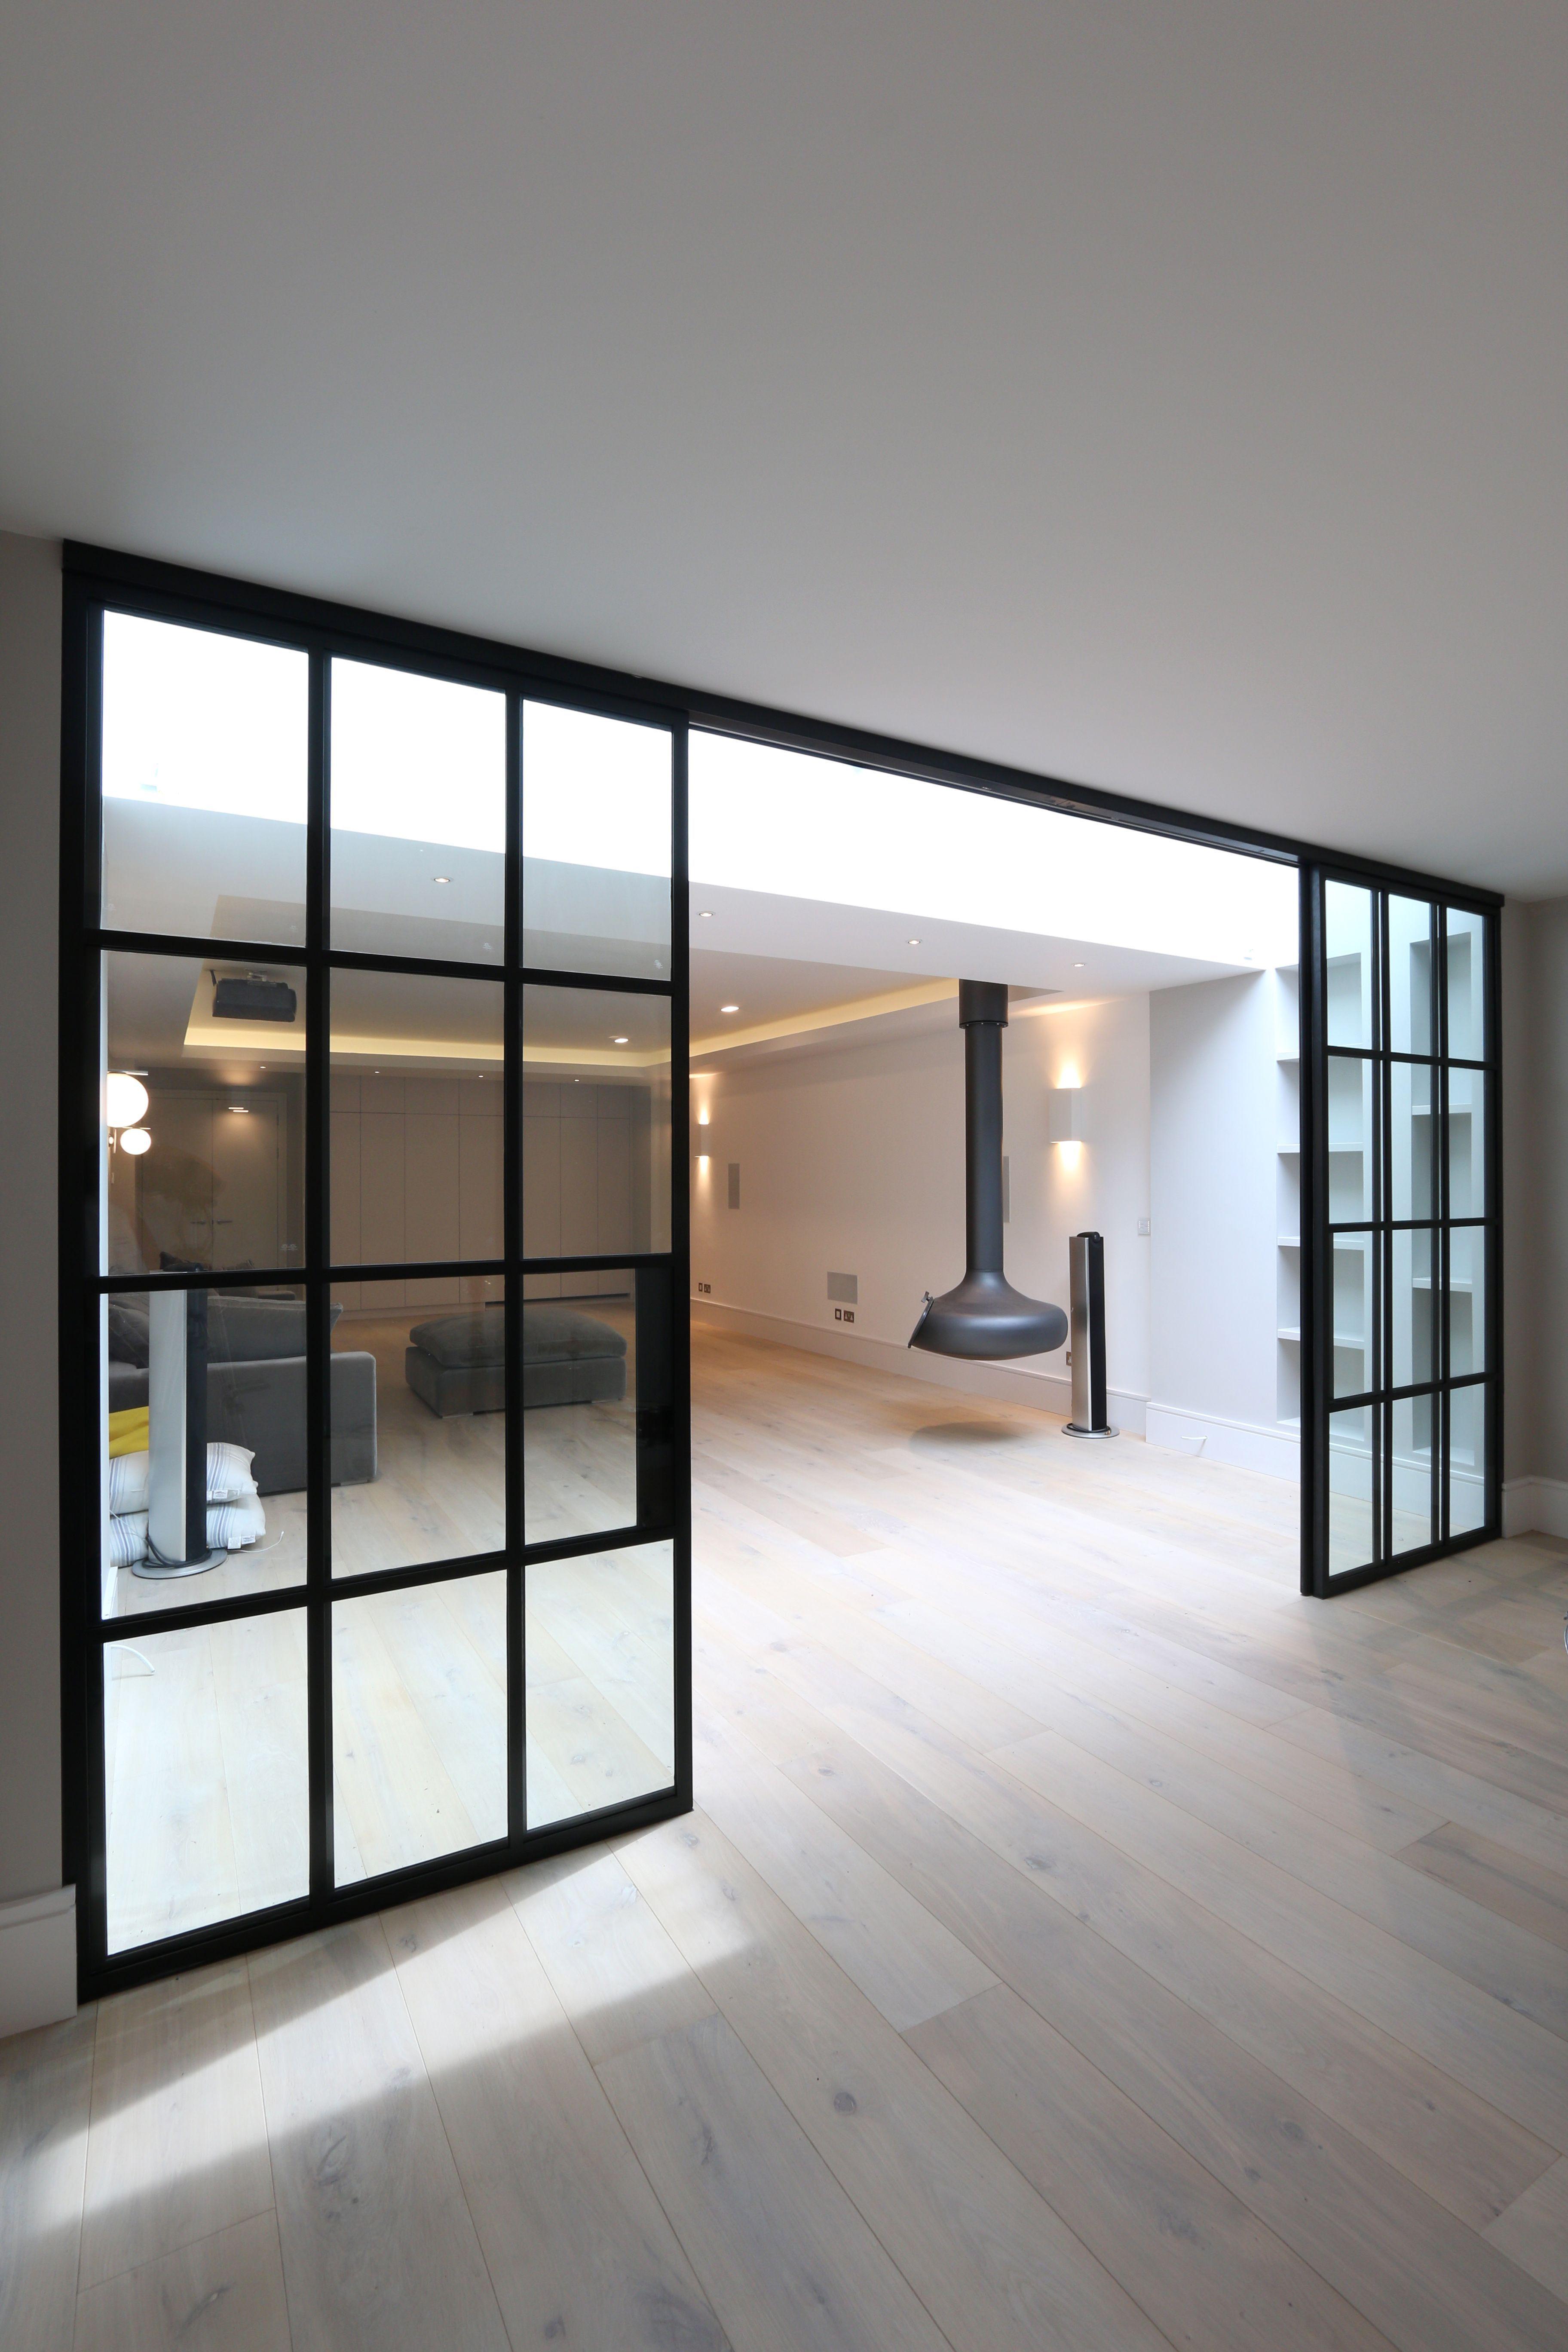 Internal Affairs Interior Designers: The Mondrian Internal System By Hedgehog Can Create Luxury